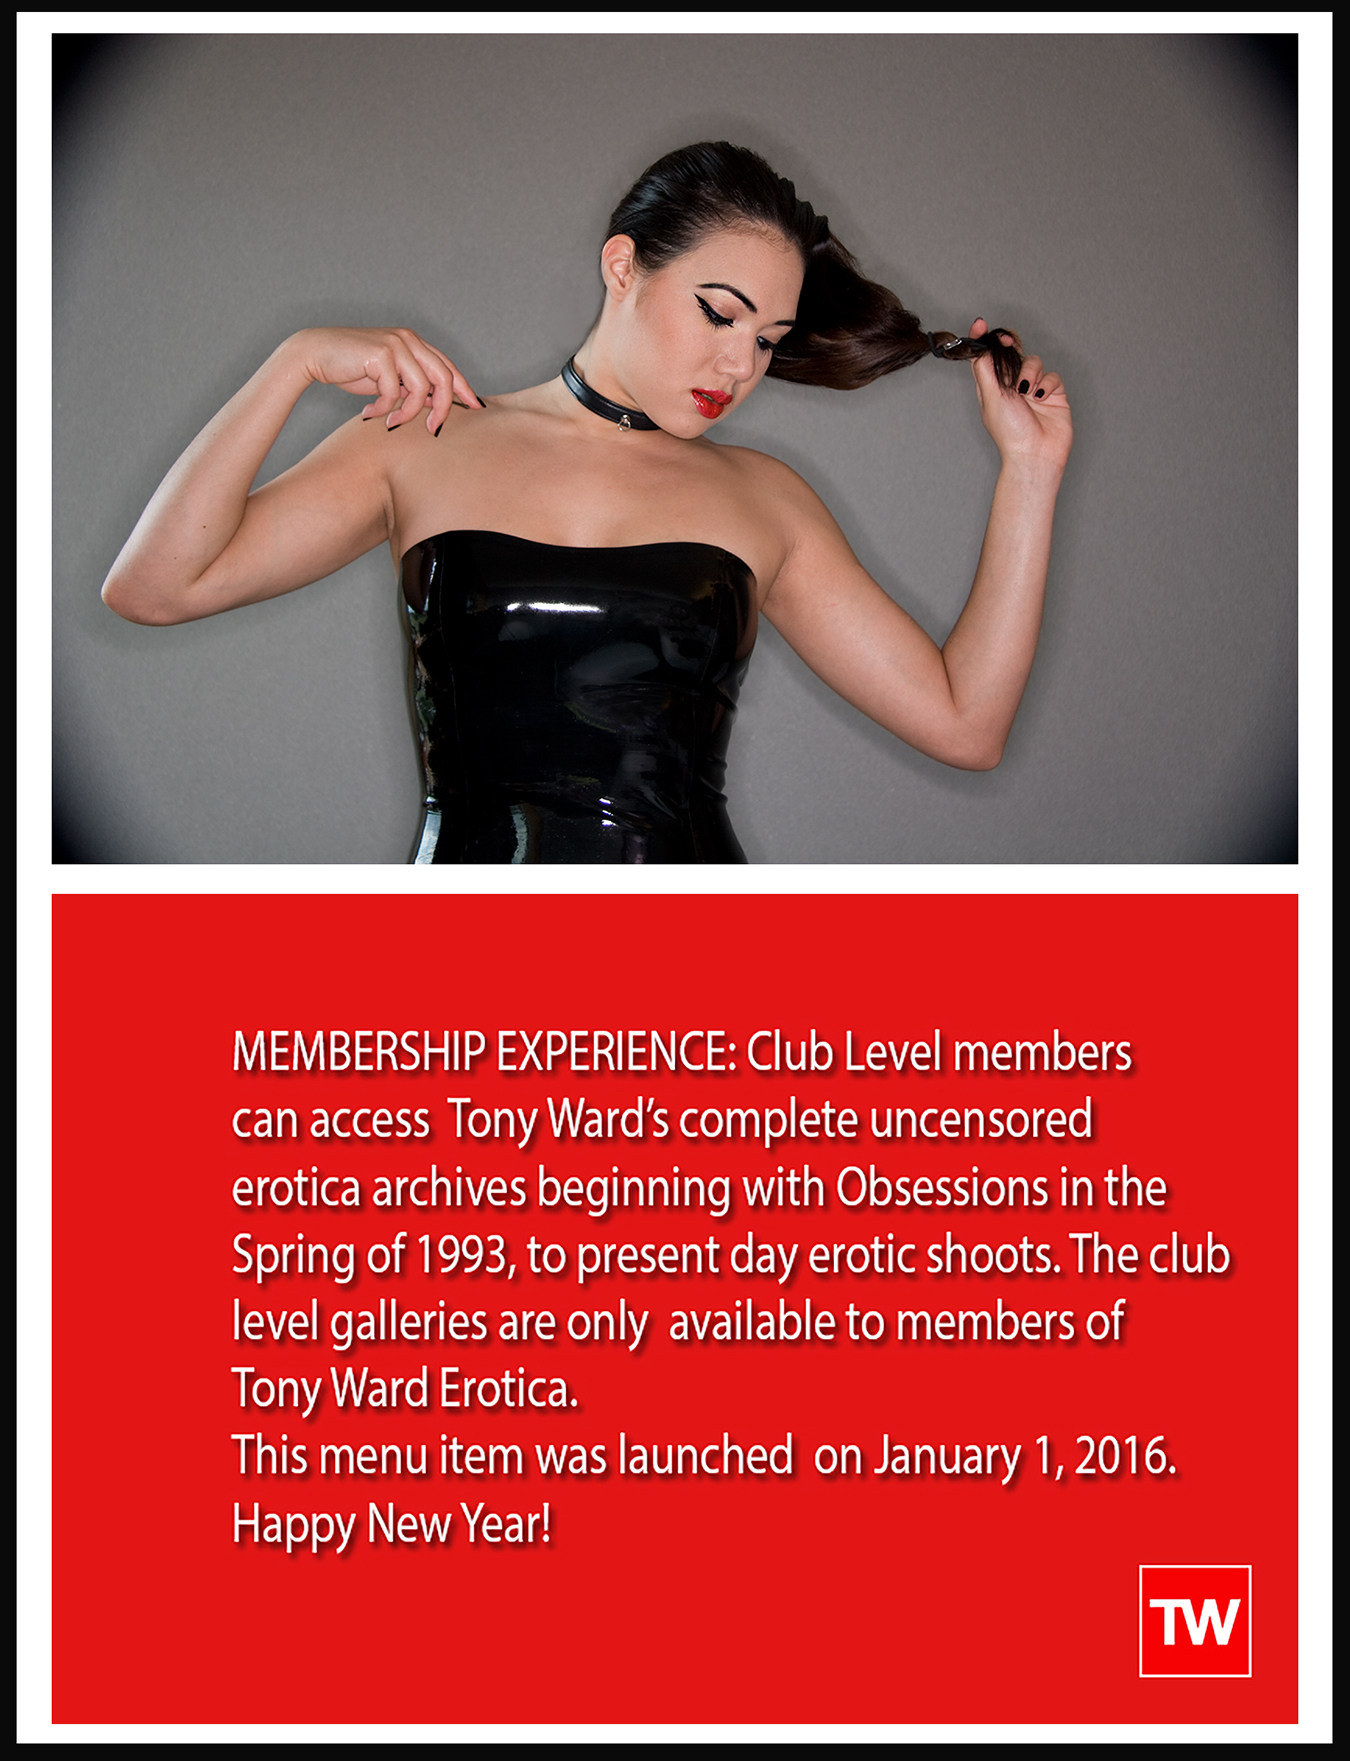 Tony_Ward_Erotica_club_level_membership_nudes_porn_hardcore_nudity_sex_lesbian_love_fetish_hetero_bondage